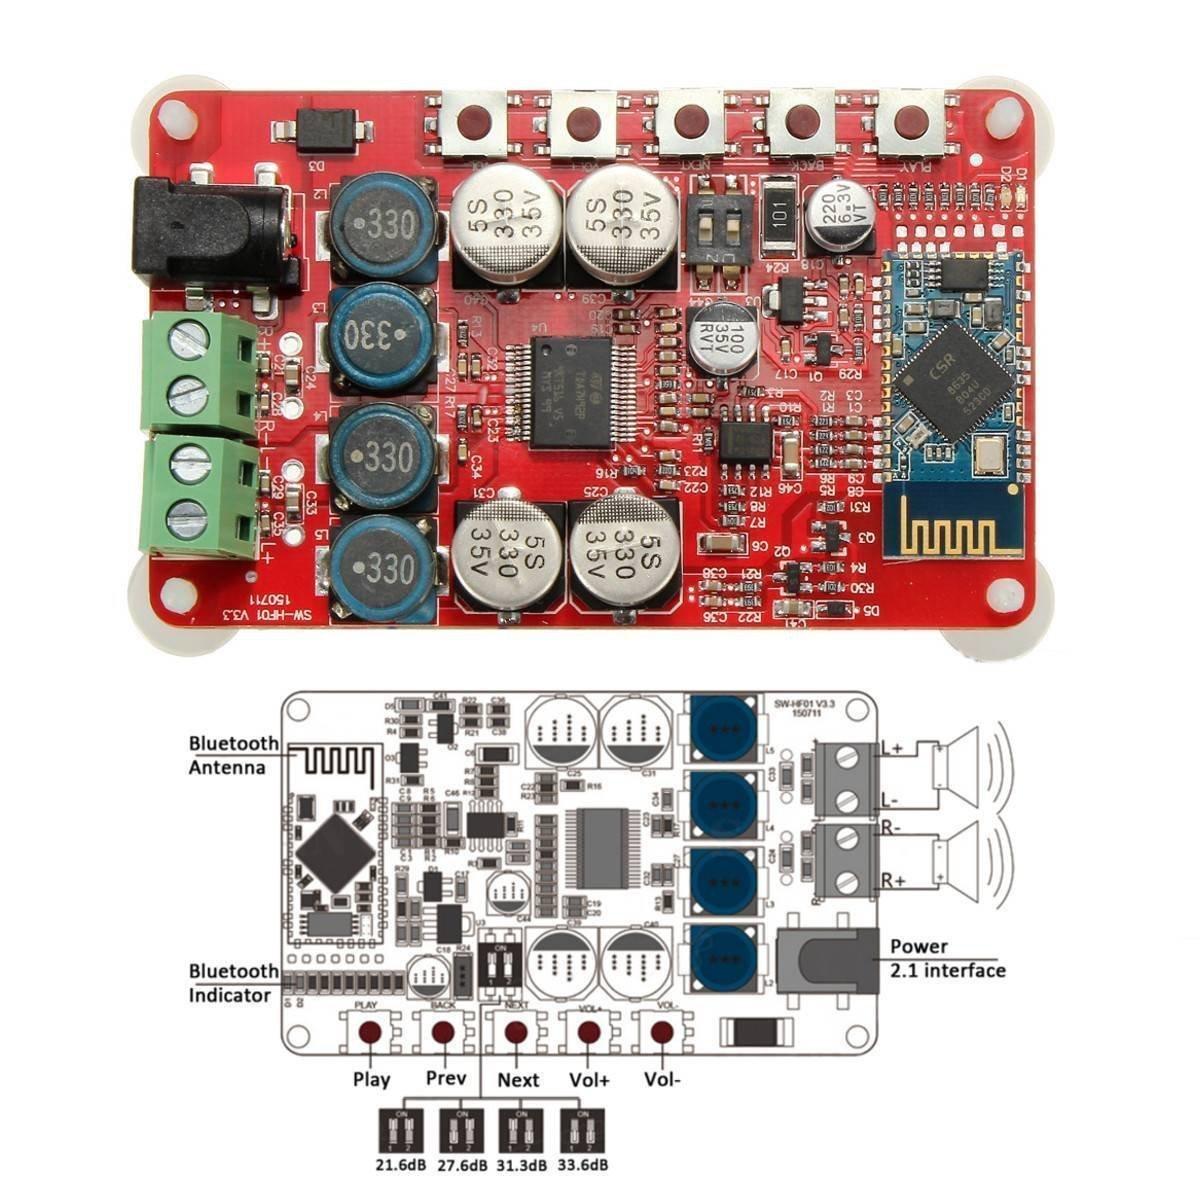 Douk Audio Tda7492p Bluetooth Csr40 Digital Amplifier Watt Power Circuit Schematic Board Receiver Amp Computers Accessories